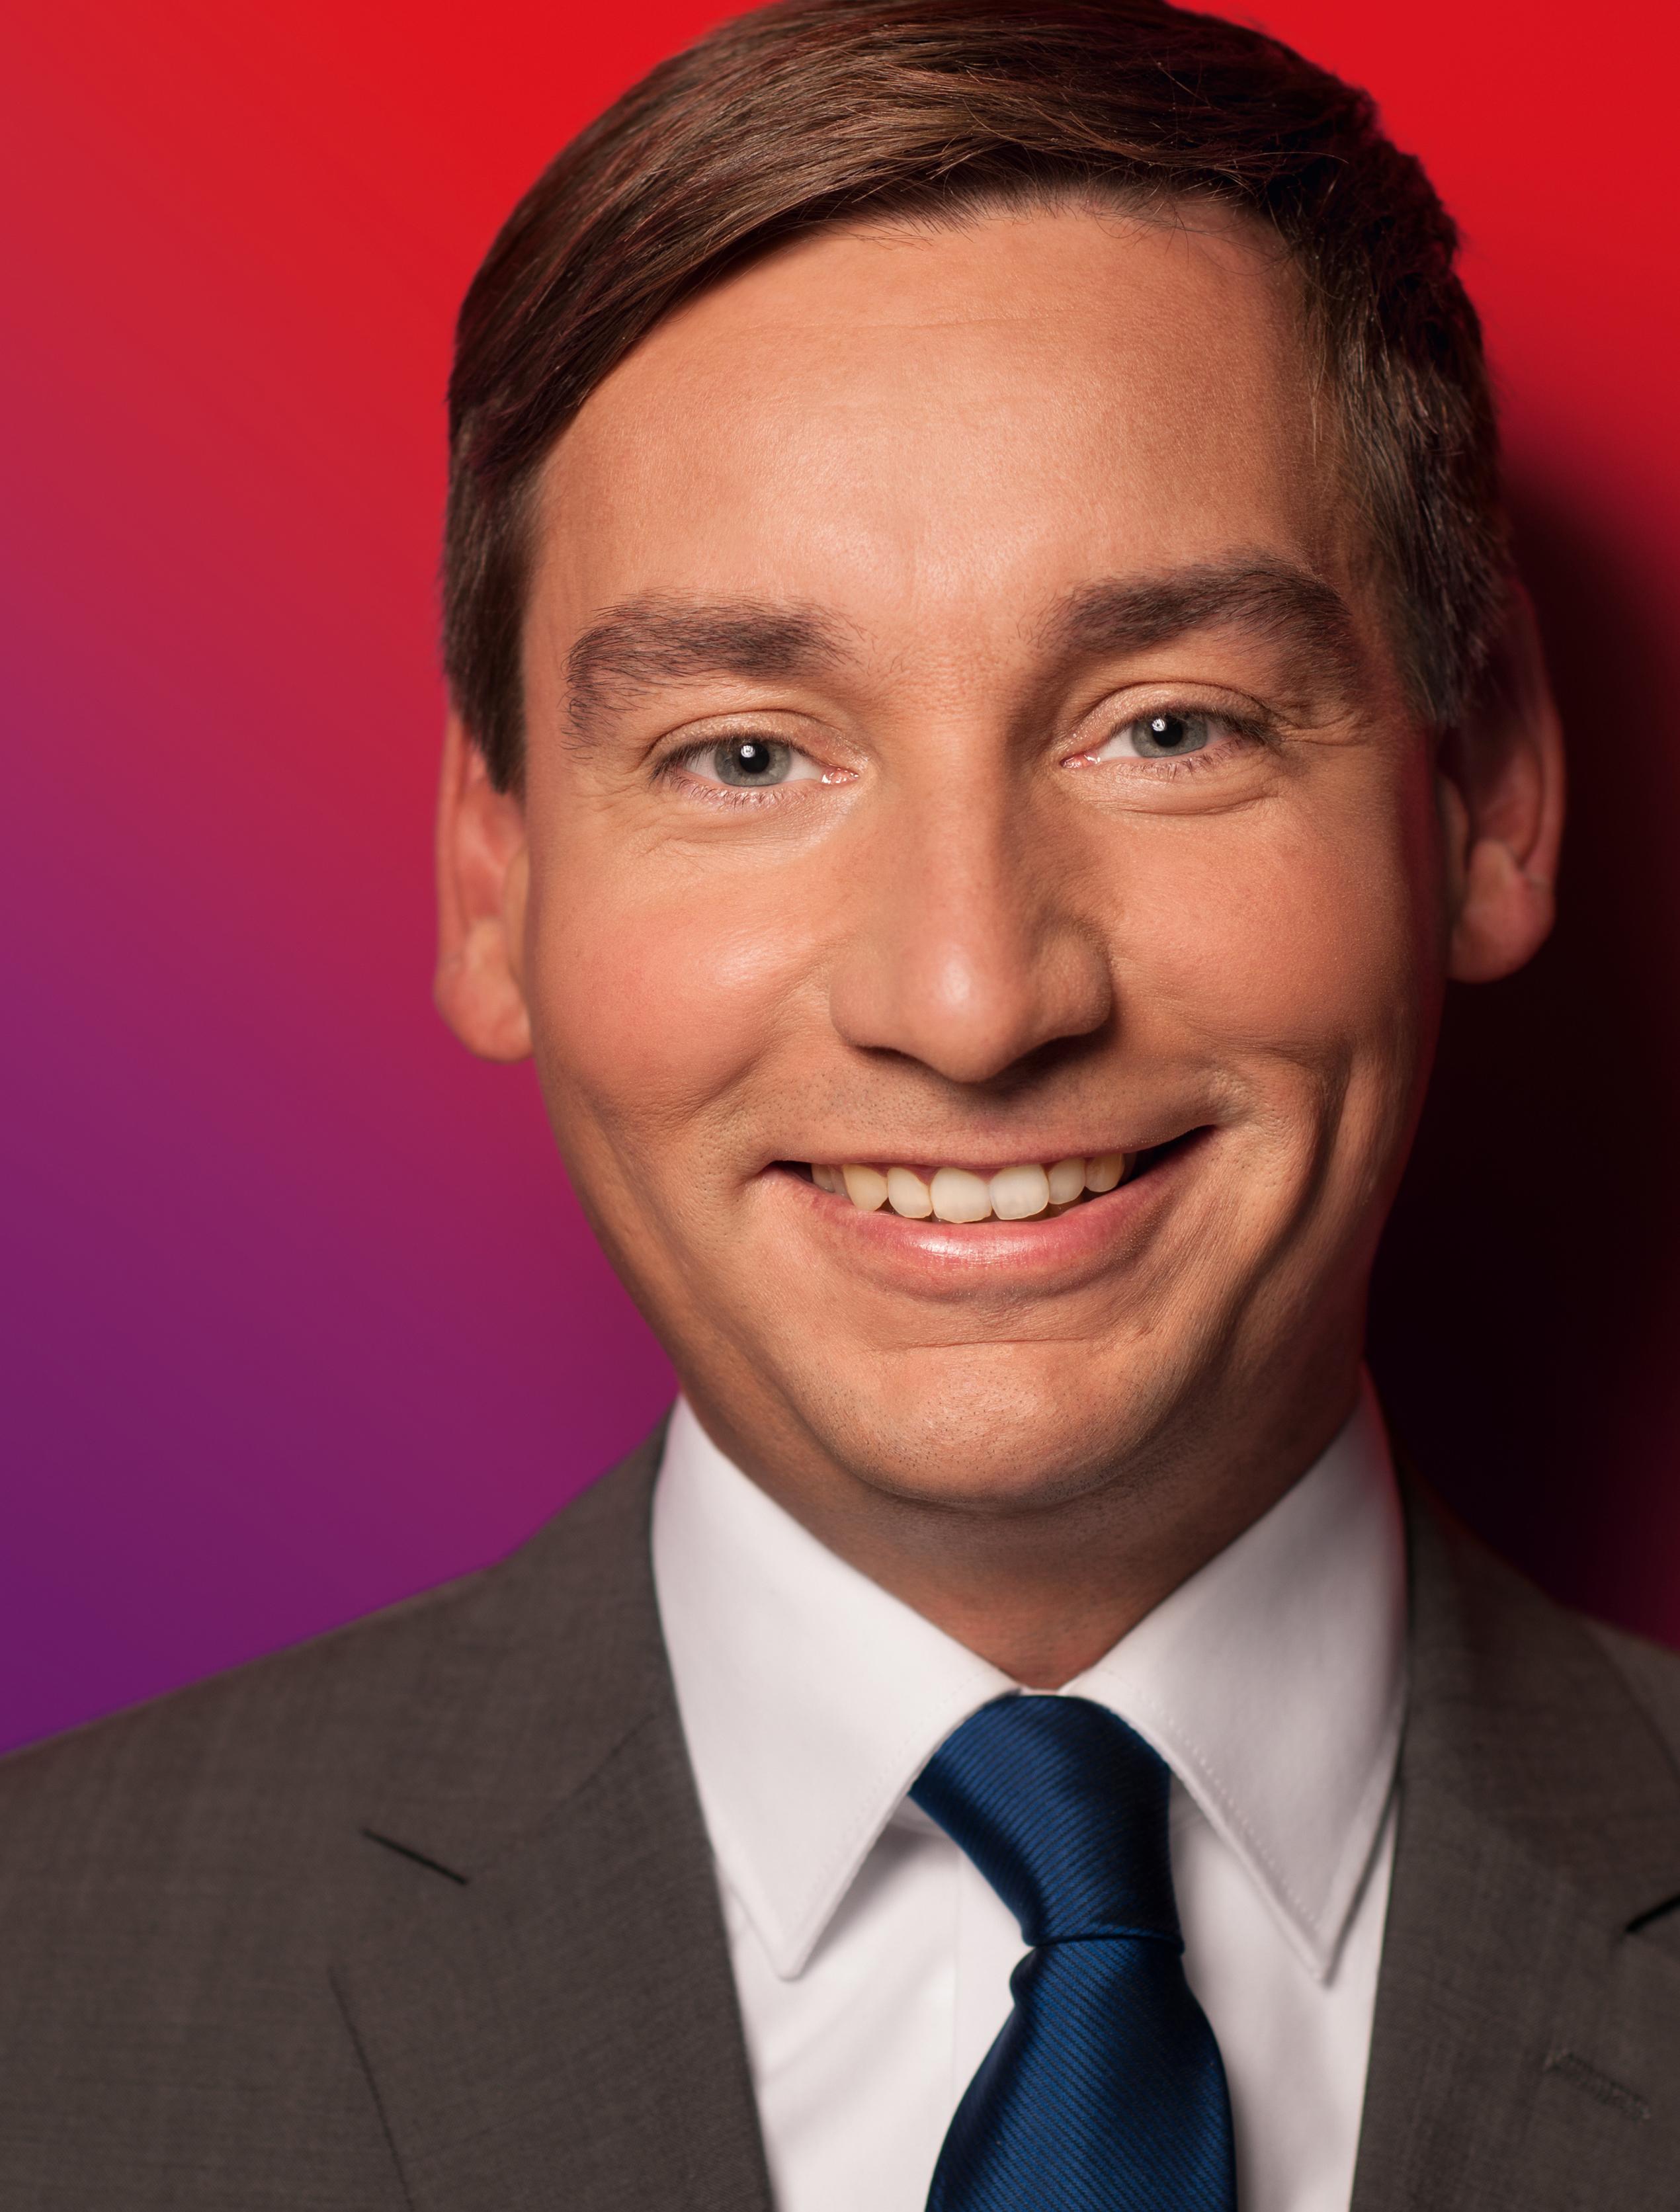 Sebastian Hartmann, MdB  SPD-Bundestagsfraktion